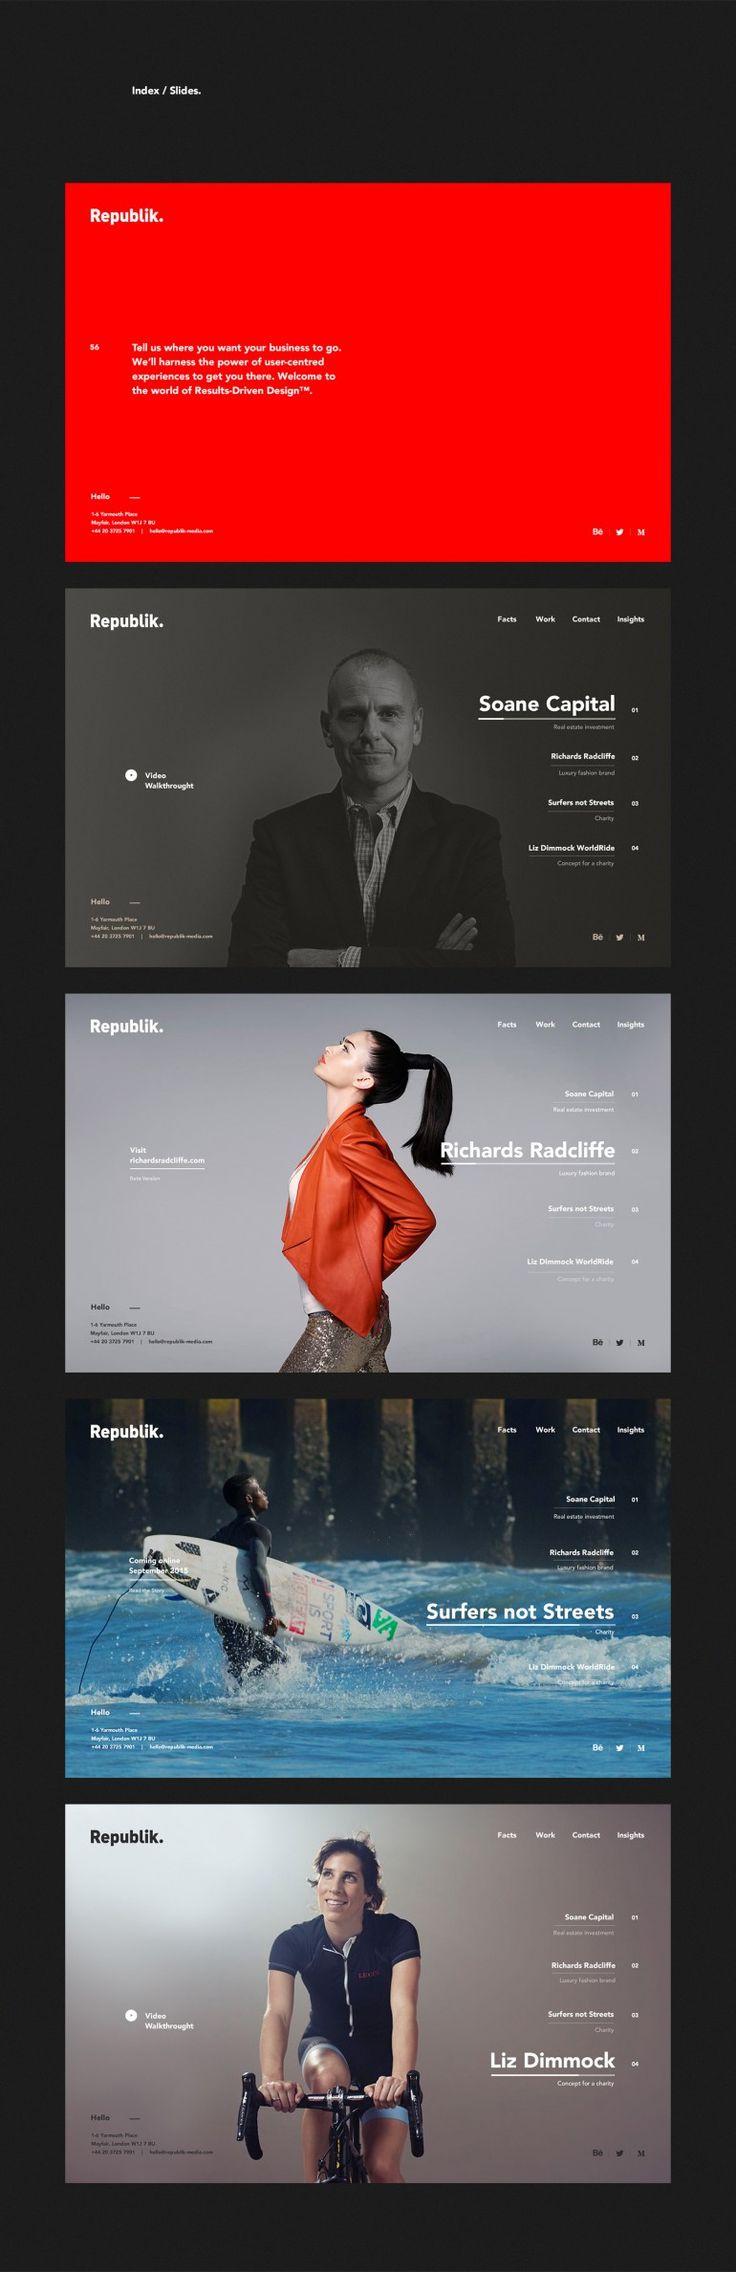 Republik Media – London based Digital Agency